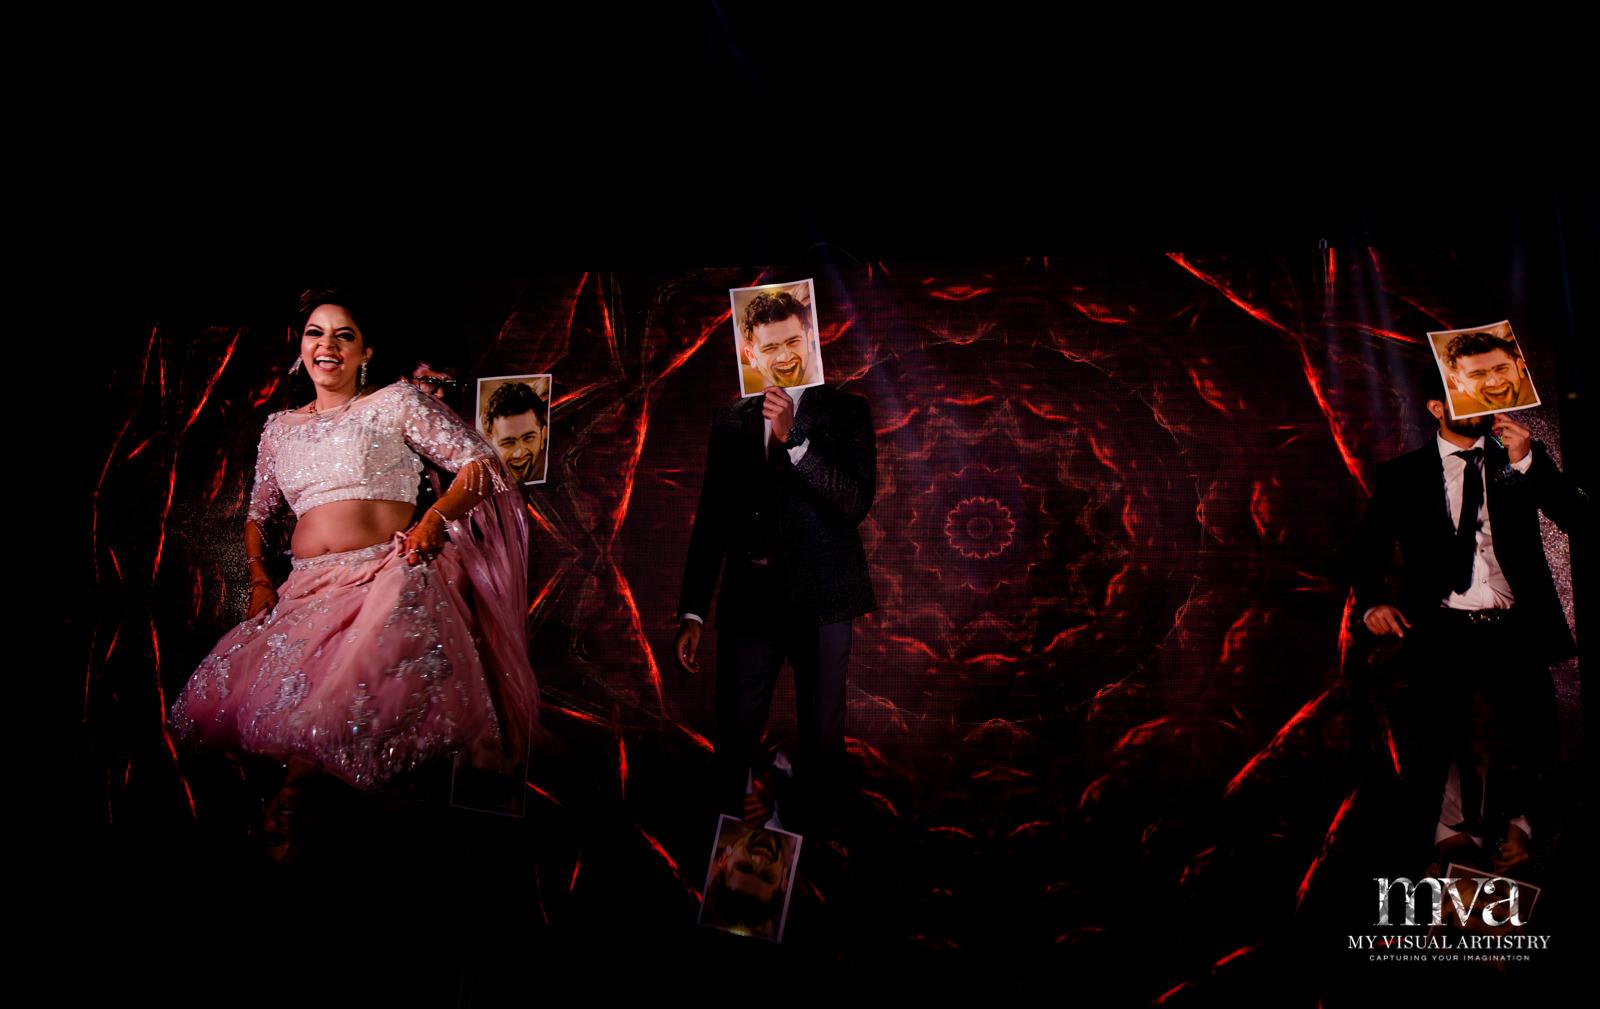 0625 -Vani_Sarang_ Photographer_My Visual Artistry_Wedding_MVA_Destination-8028.jpg